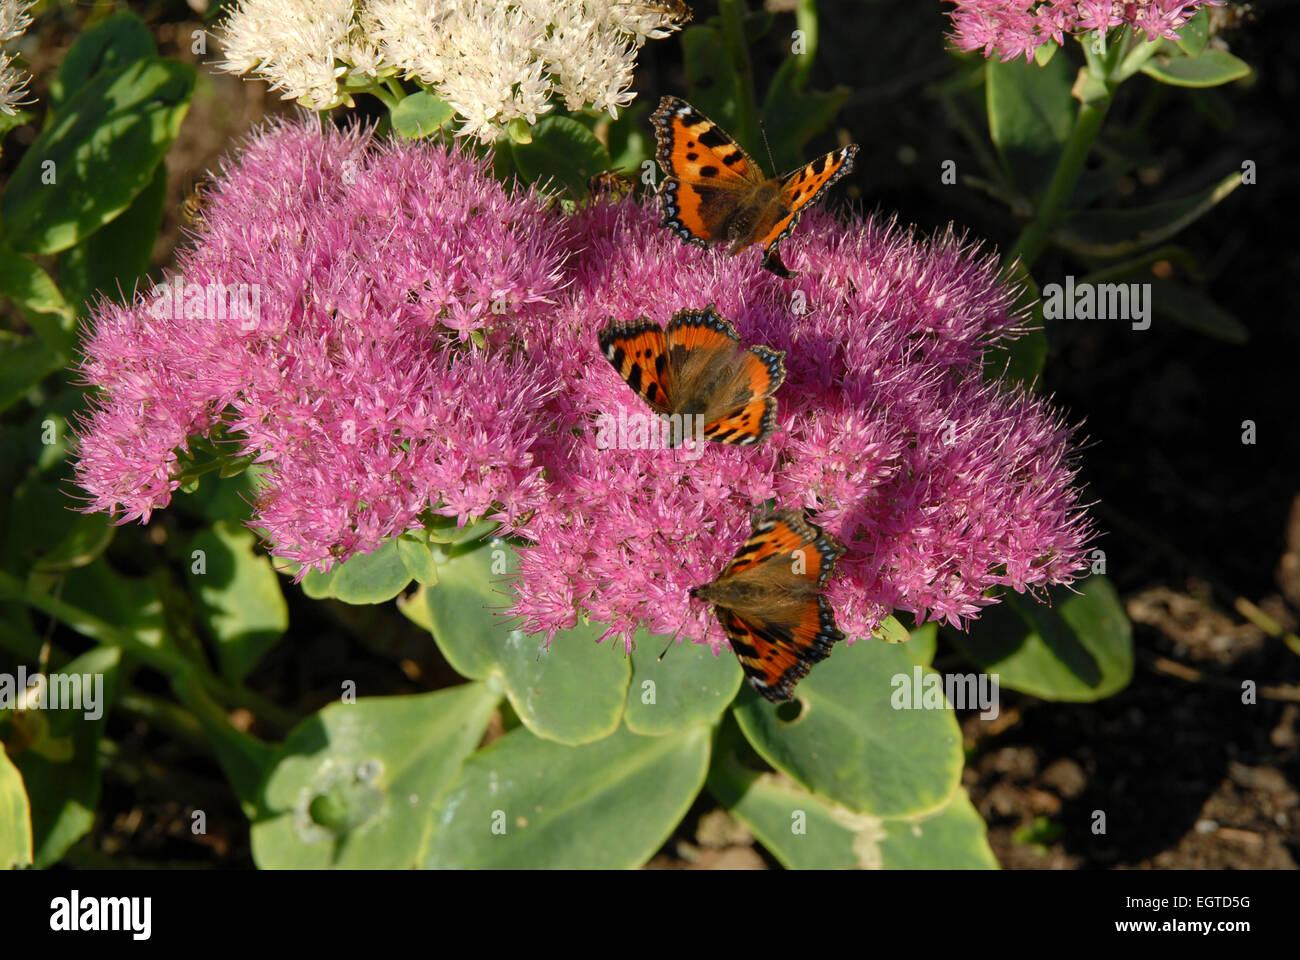 Three Small Tortoiseshell Butterflies, Aglais urticae, feeding on Sedum spectabile, or Ice-plant. - Stock Image